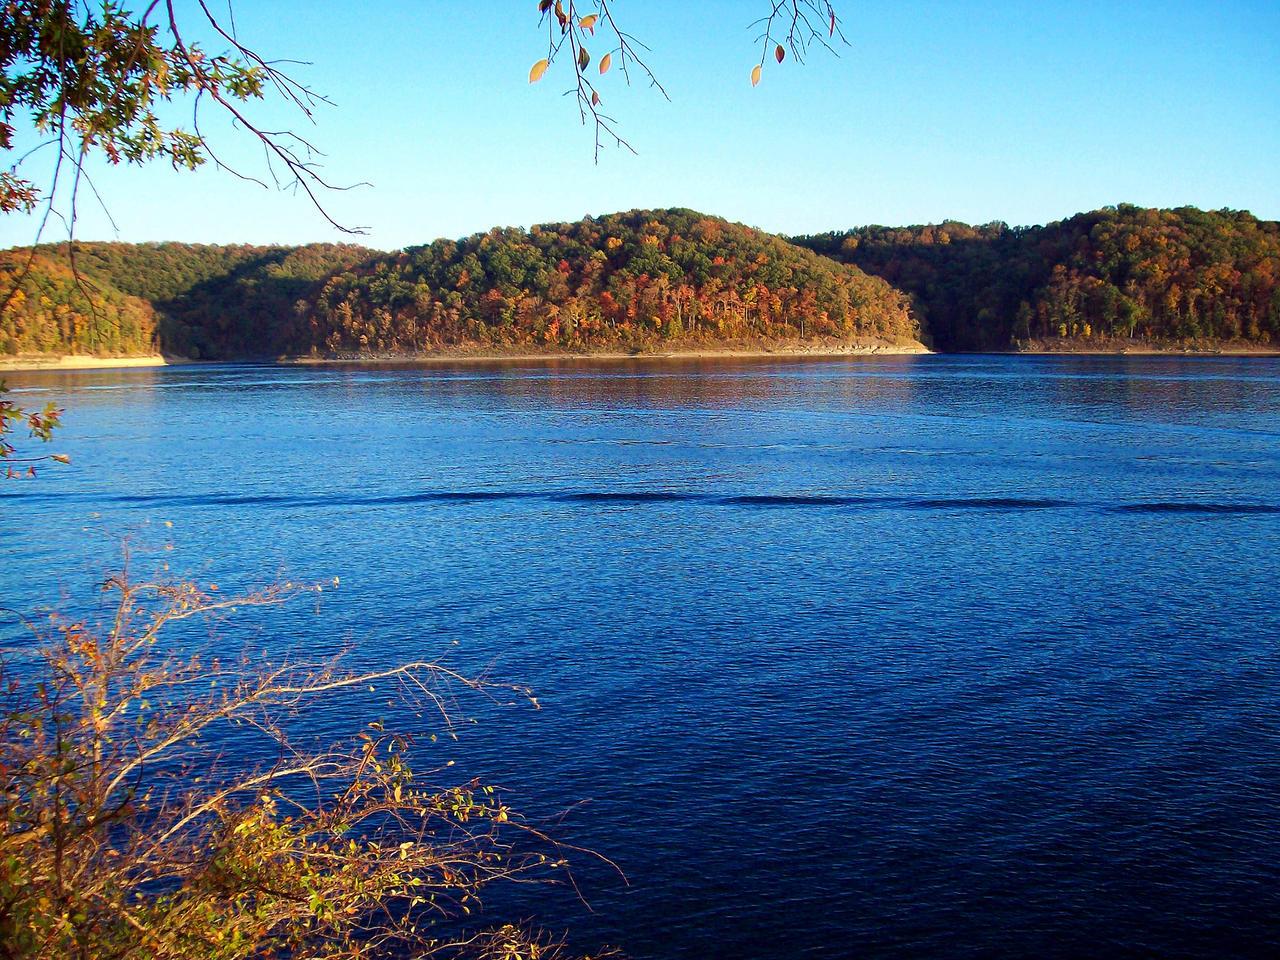 Lakeside Fall by Mistshadow2k4